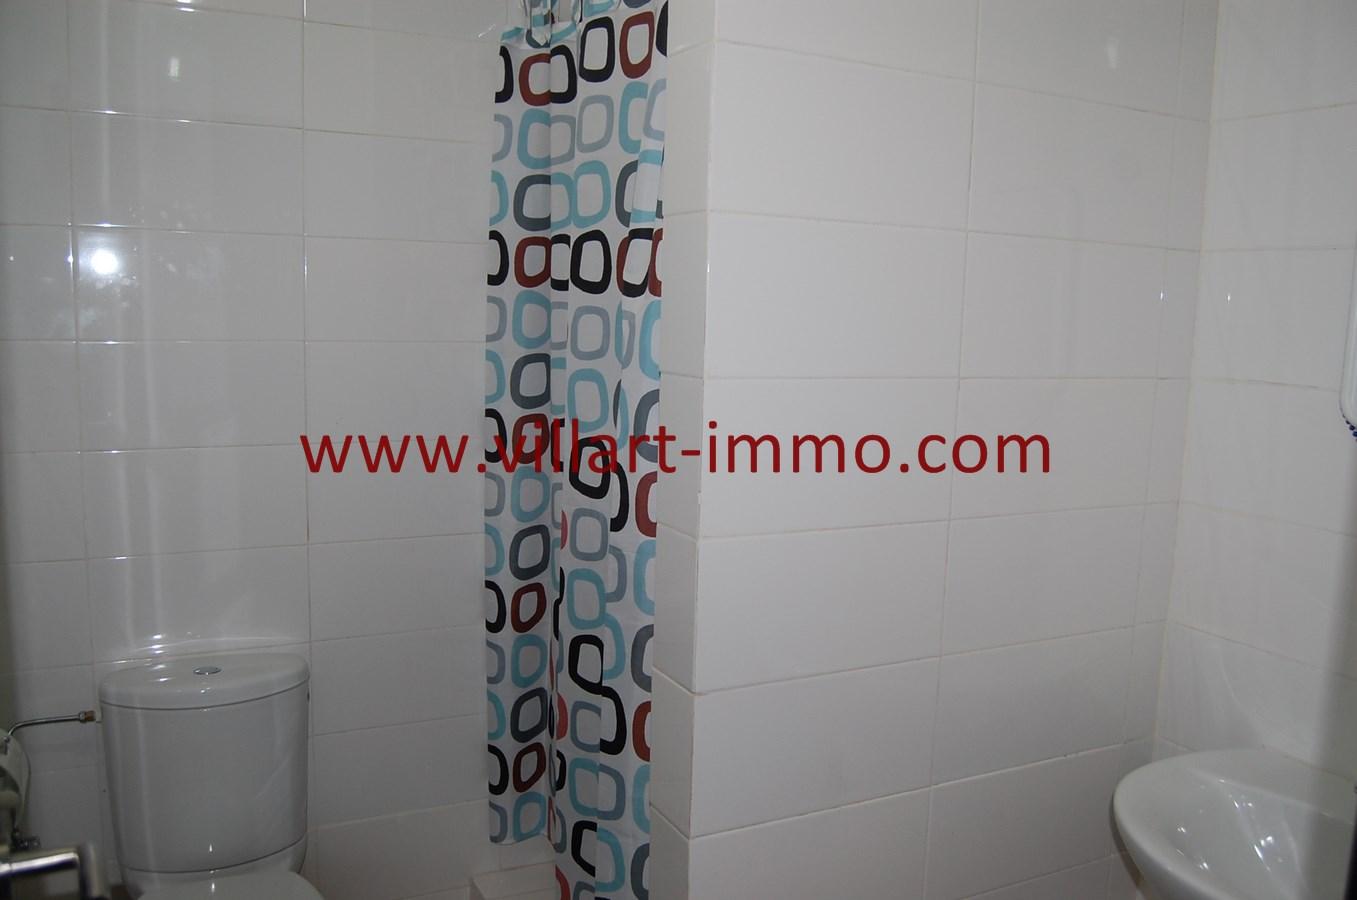 9-Vente-Appartement-Tanger-Route-de-Rabat-Salle-de-Bain 2-VA474-Villart Immo